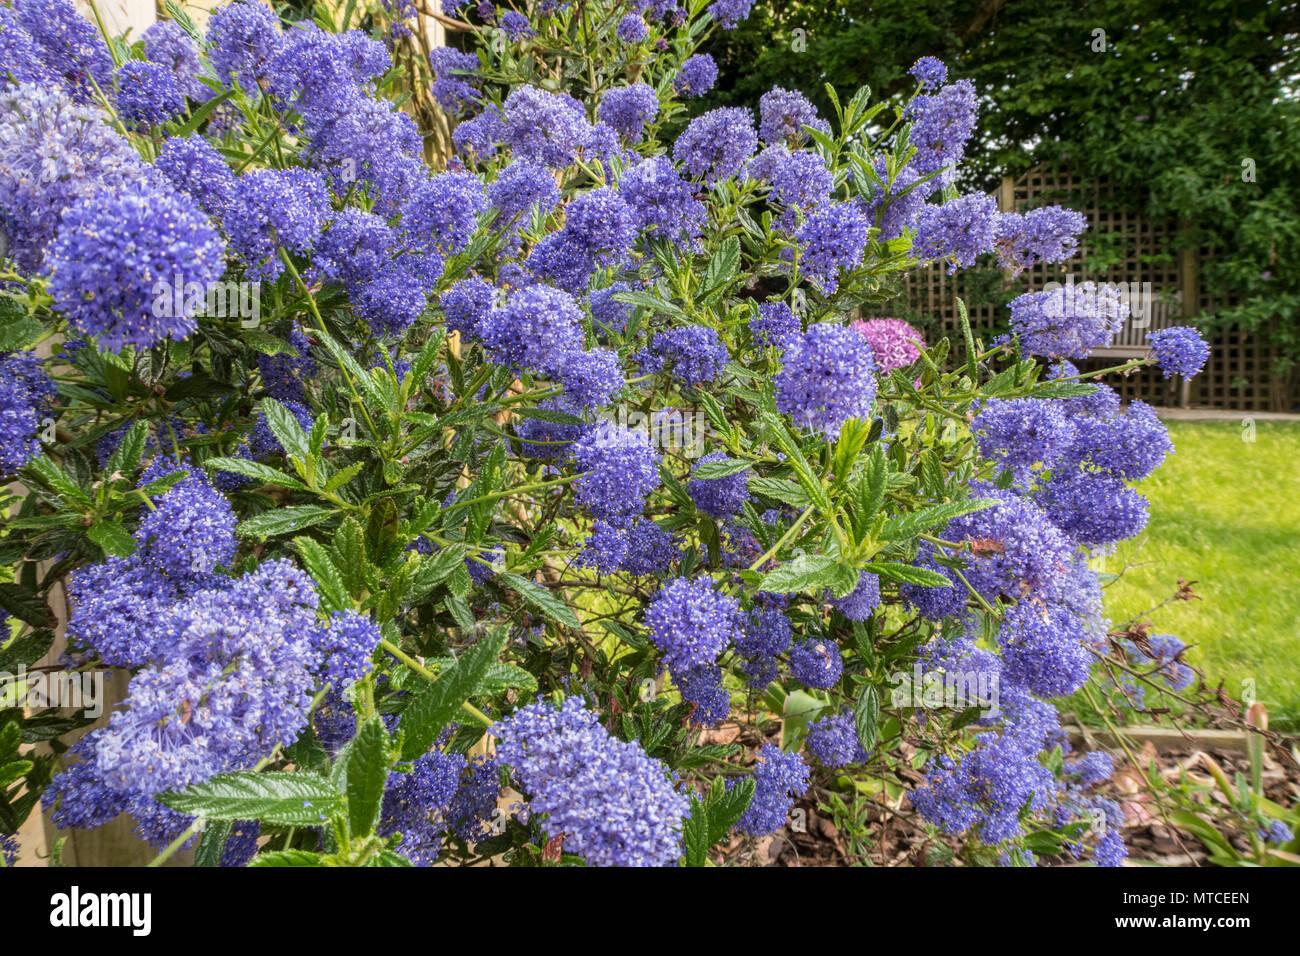 Flower trellis stock photos & flower trellis stock images alamy